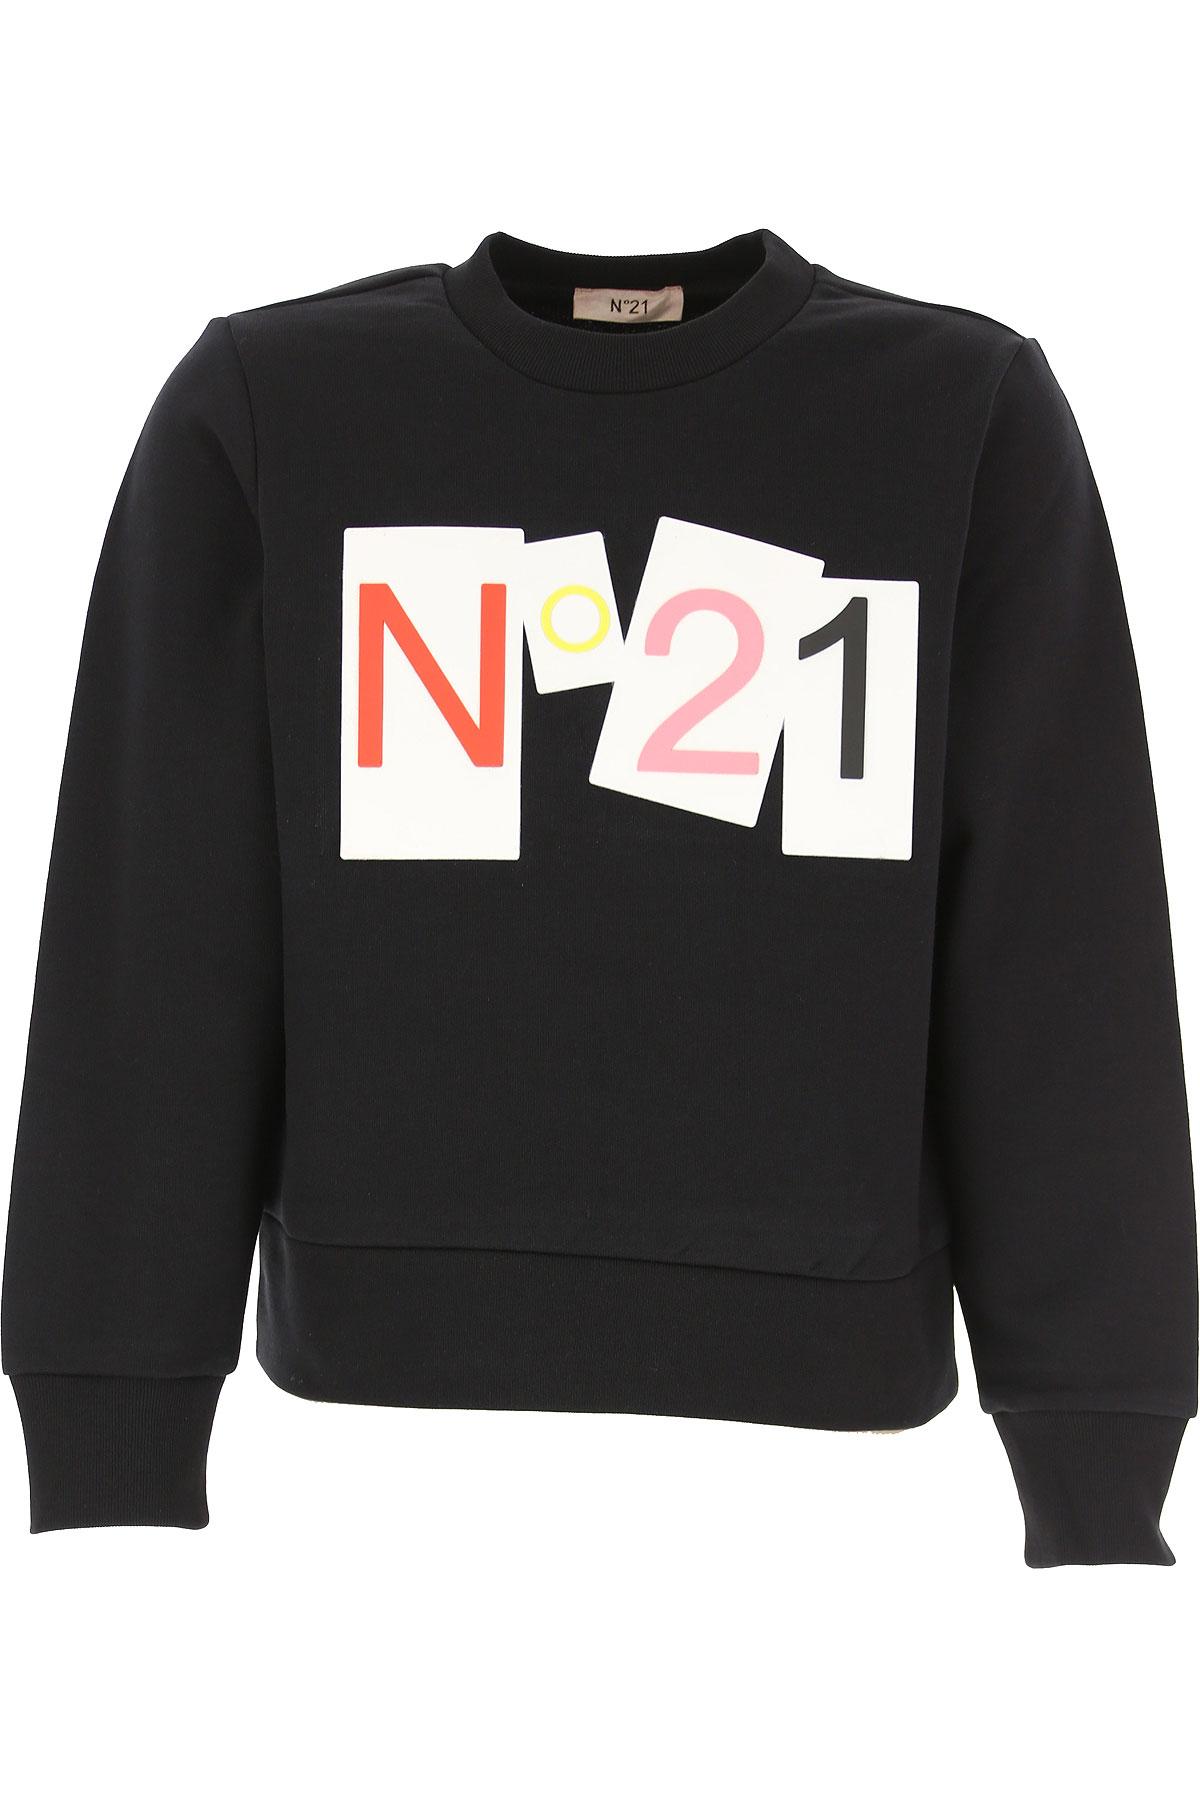 NO 21 Kids Sweatshirts & Hoodies for Girls On Sale, Black, Cotton, 2019, 10Y 12Y 4Y 6Y 8Y